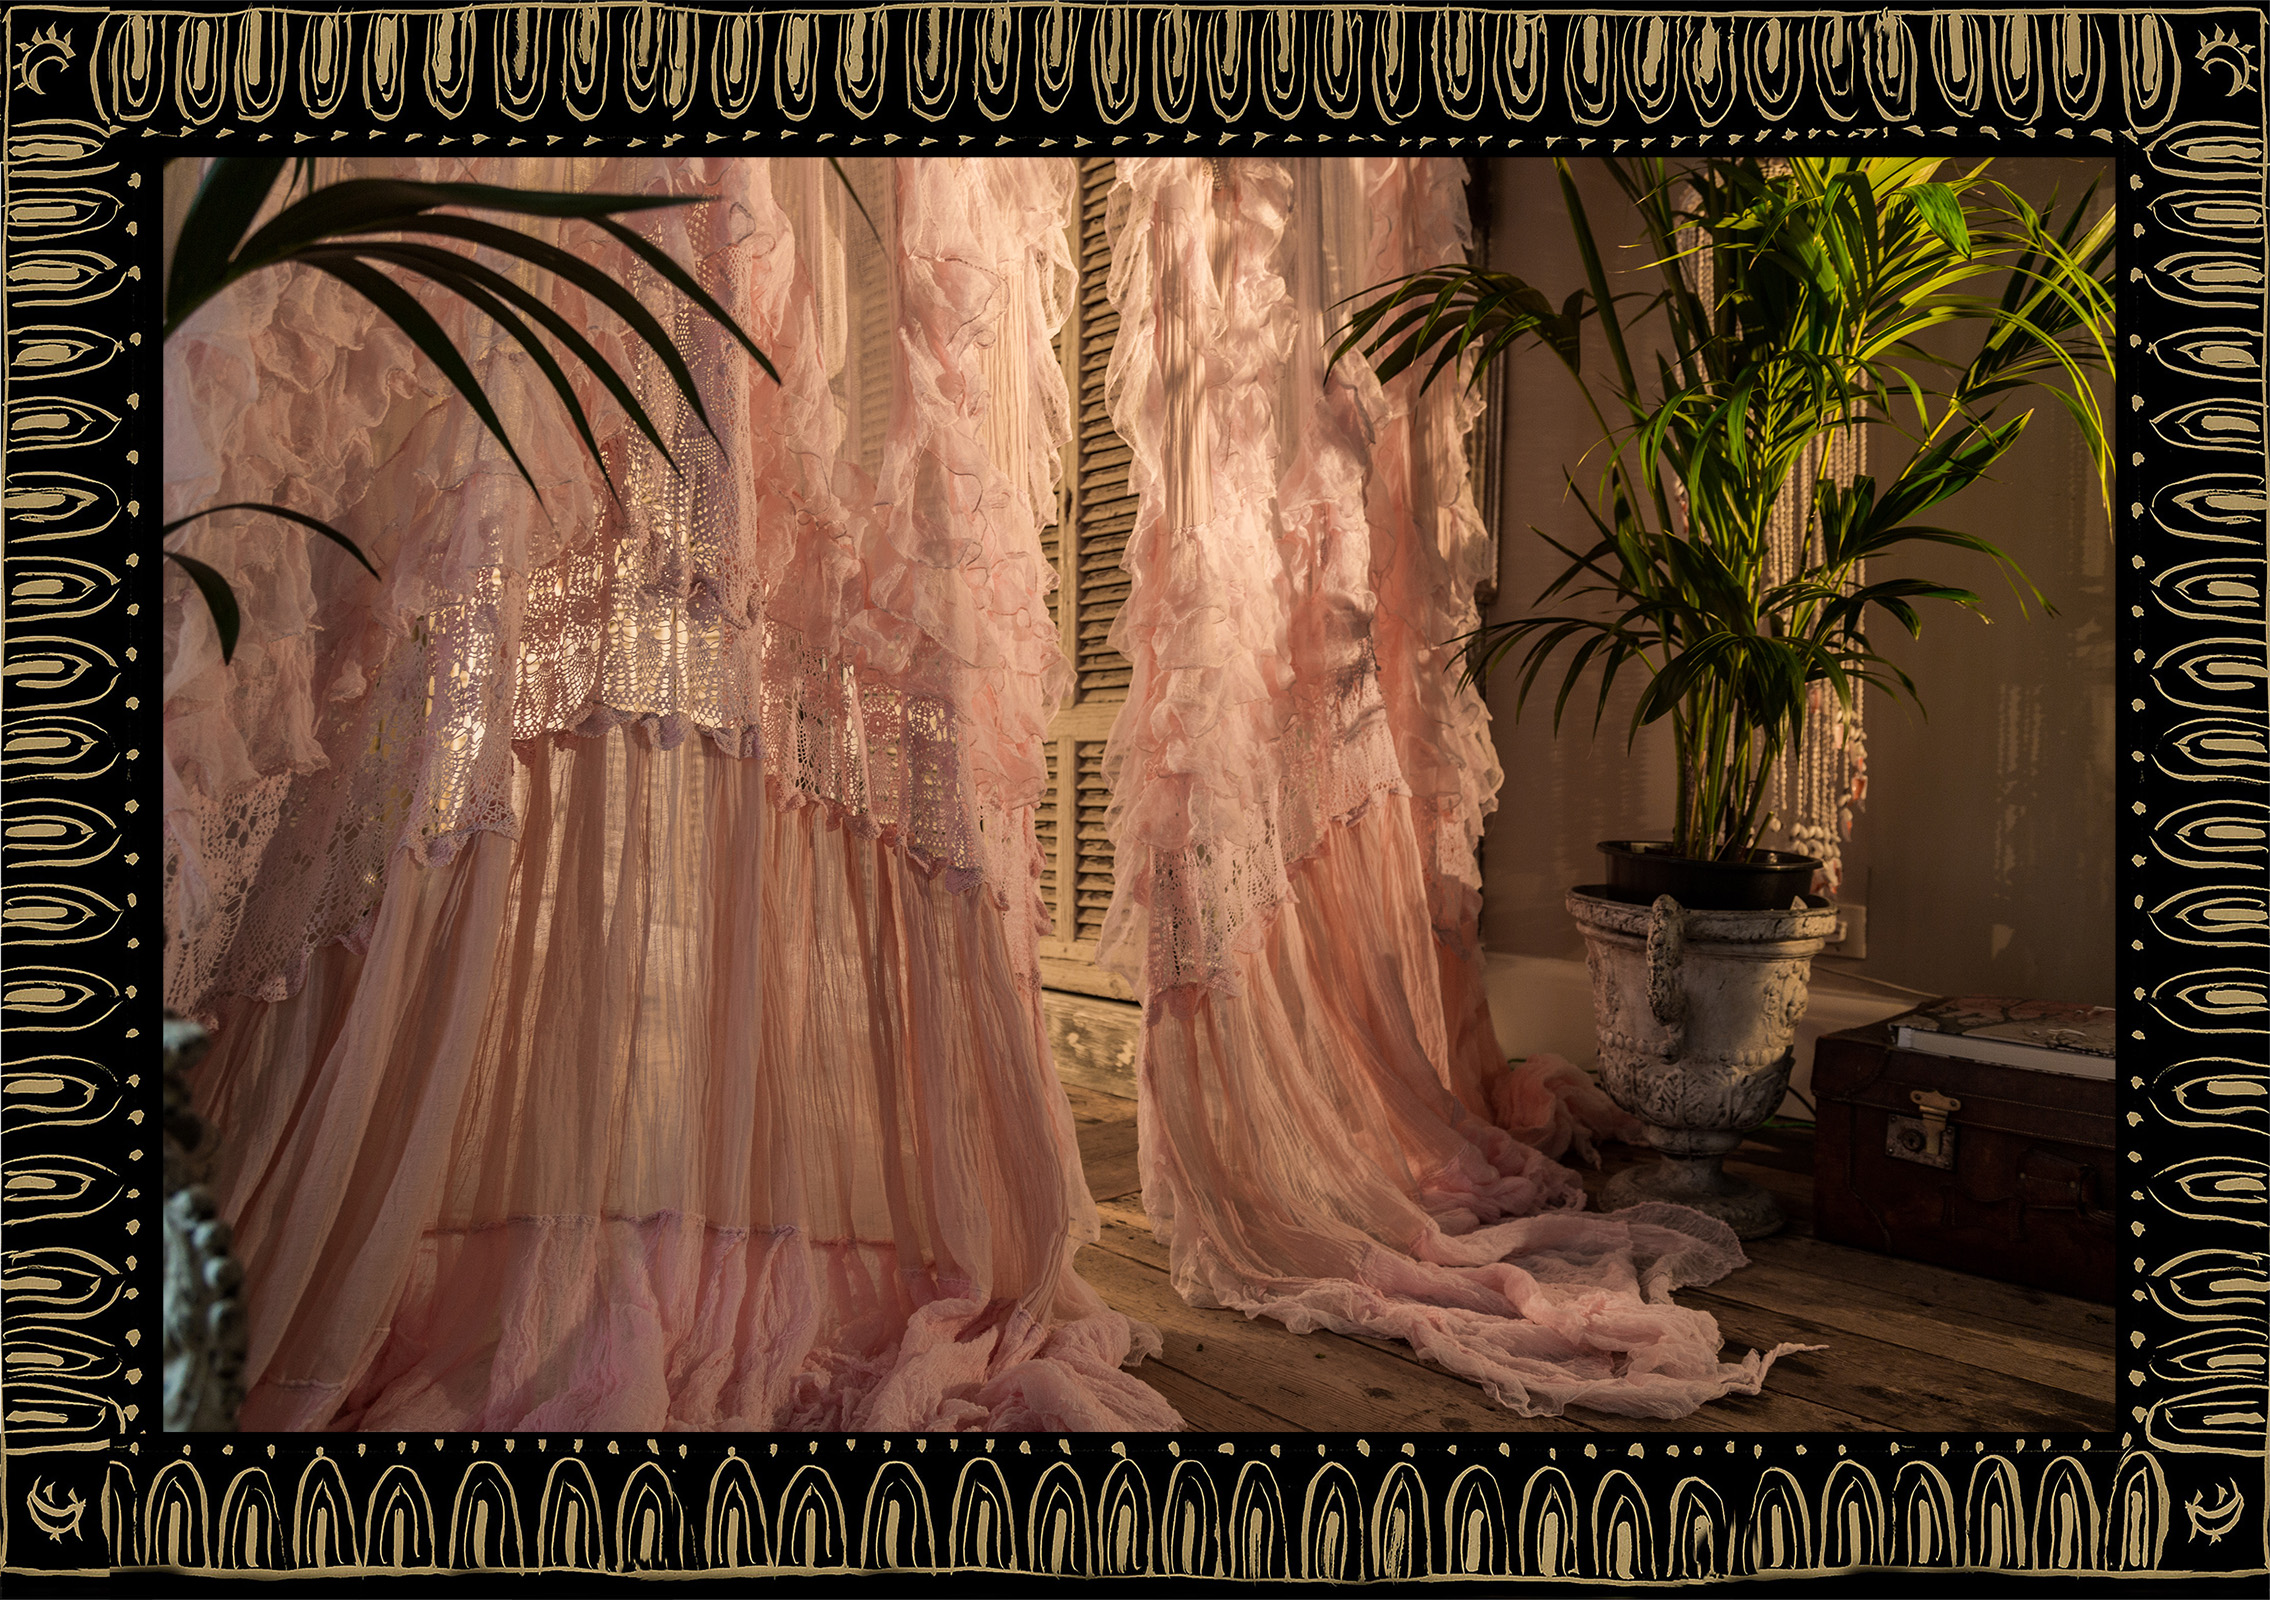 Curtain-23.jpg